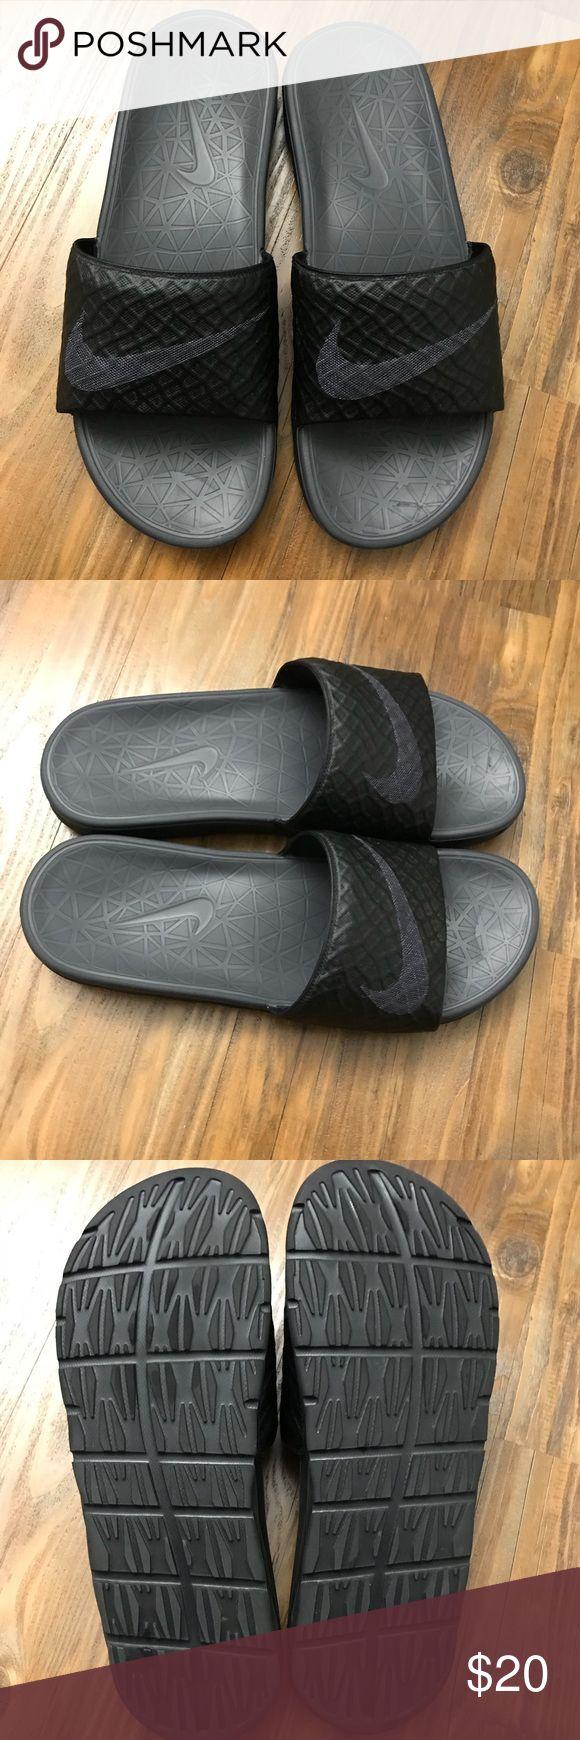 Men's Nike Slide Like New.   Nike Benassi Slide 2  Great condition. I am selling the slides only, as I no longer have the box. Nike Shoes Sandals & Flip-Flops